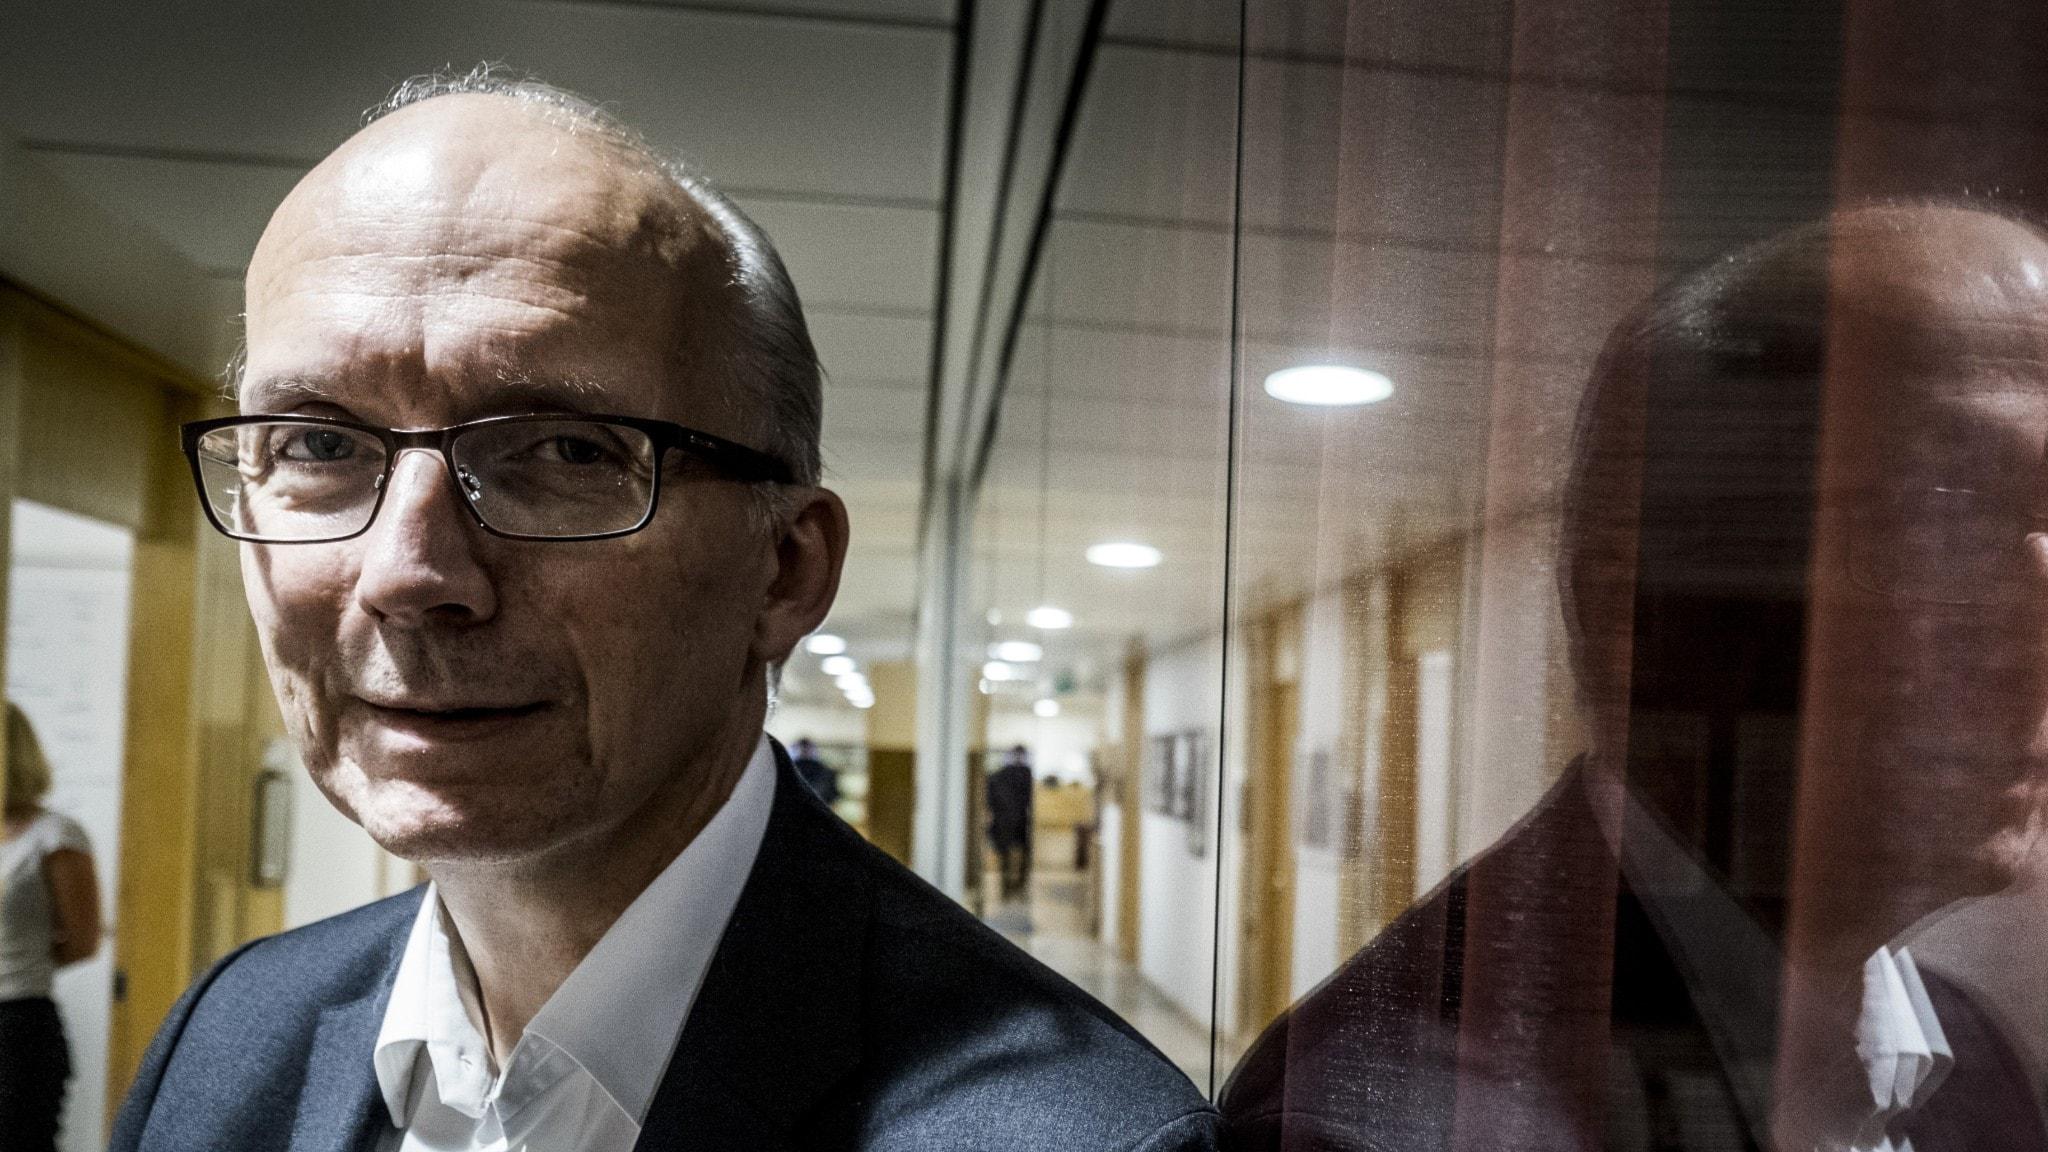 Ekots lördagsintervju med Urban Hansson Brusewitz, Konjunkturinstitutet - spela